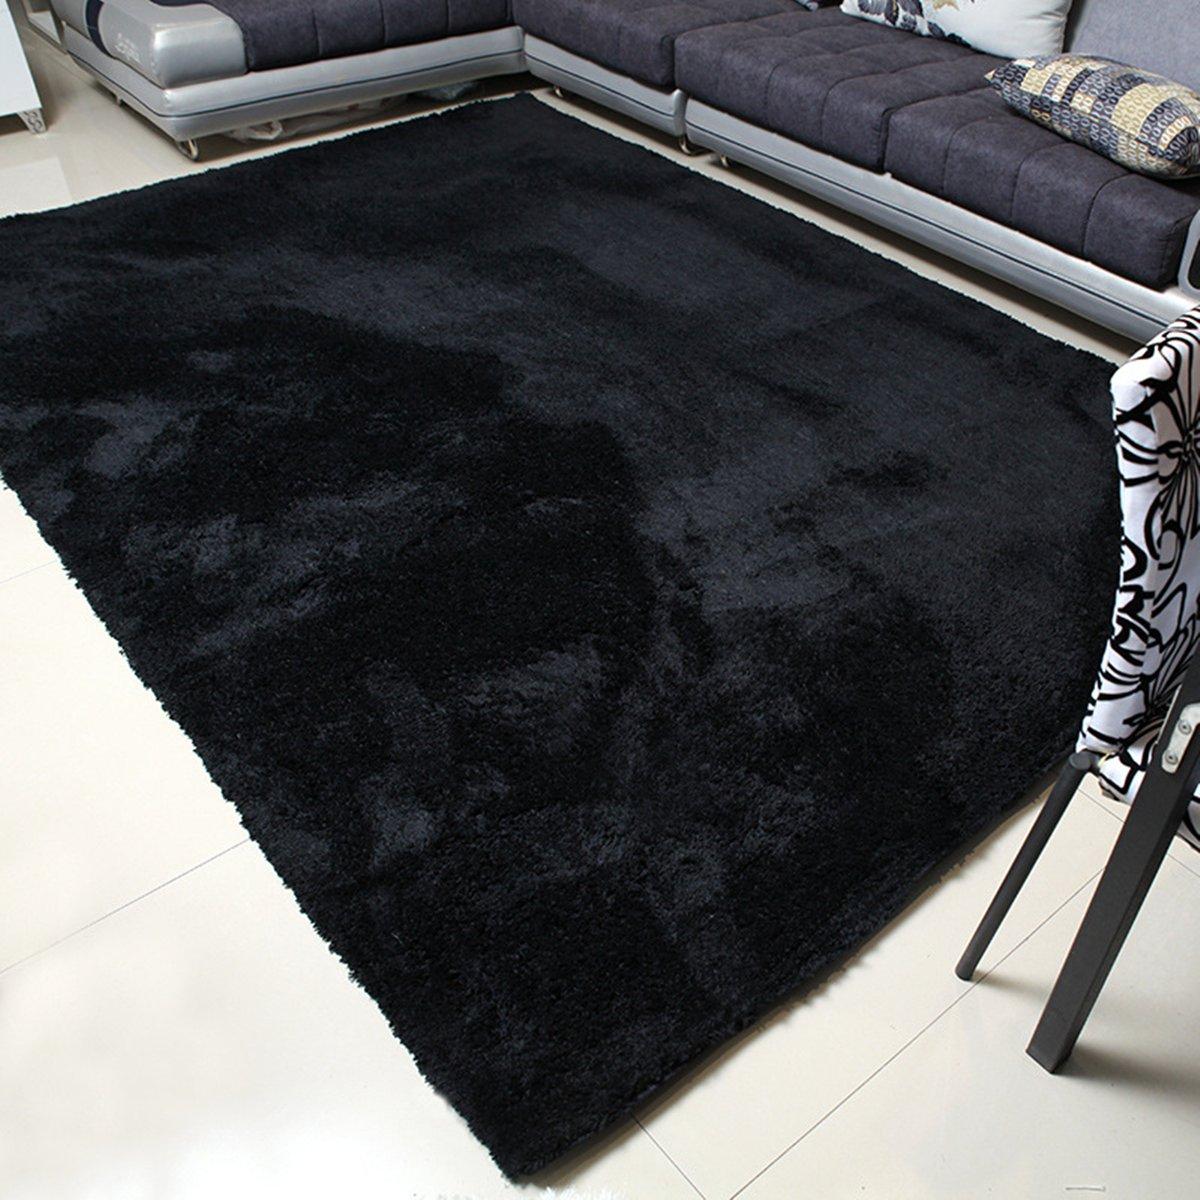 Attirant MBIGM Super Soft Modern Area Rugs, Living Room Carpet Bedroom Rug, Nursery  Rug,